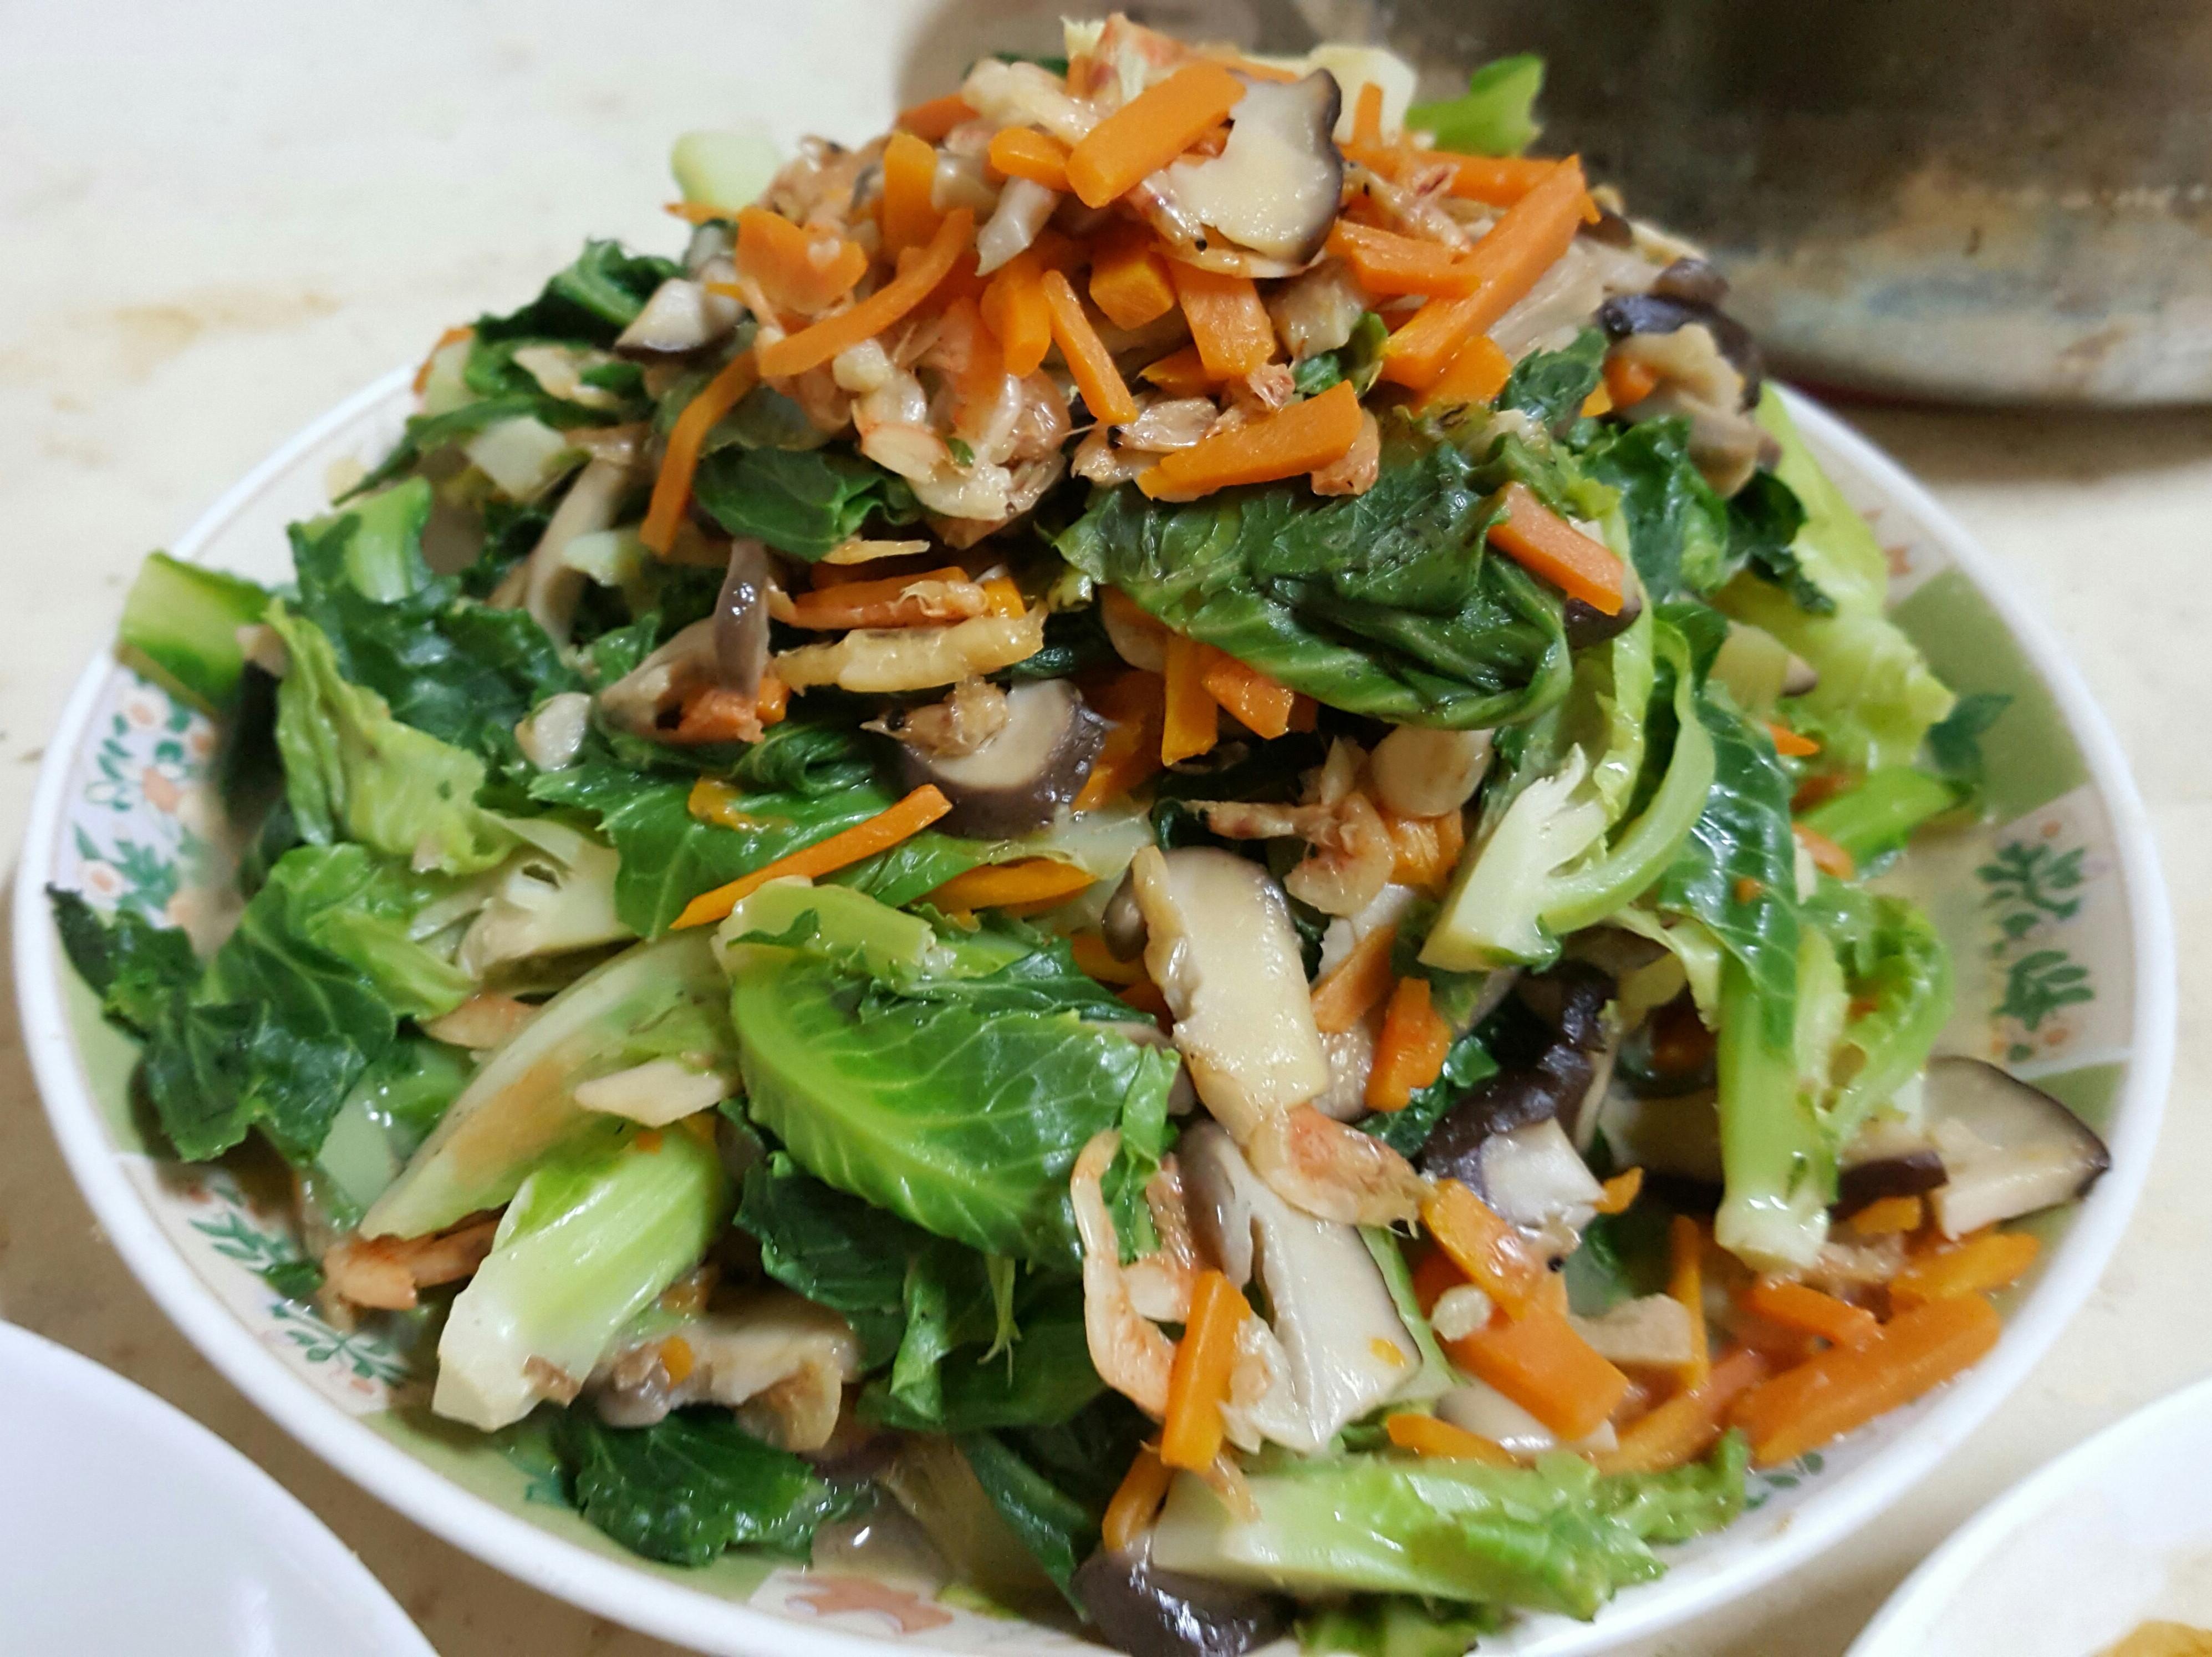 櫻花蝦炒高麗菜苗